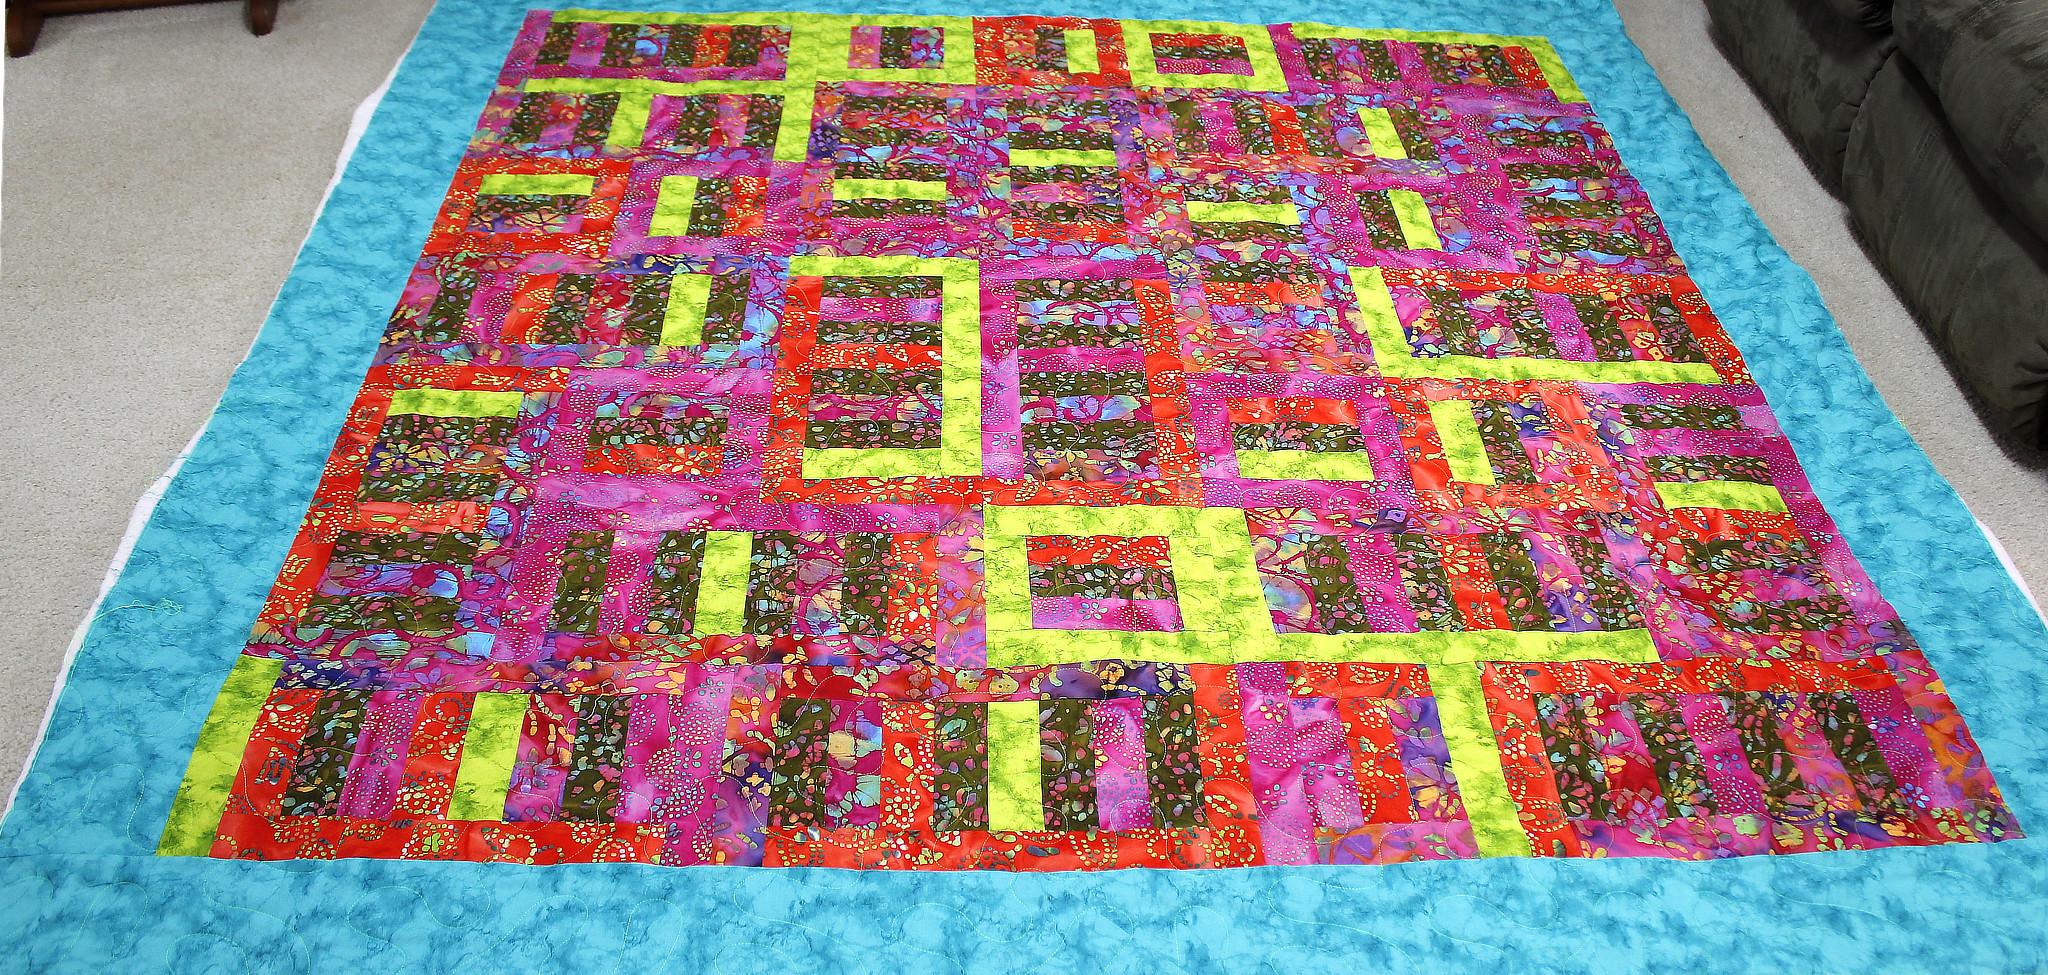 Angela's Batik Jelly Roll Quilt